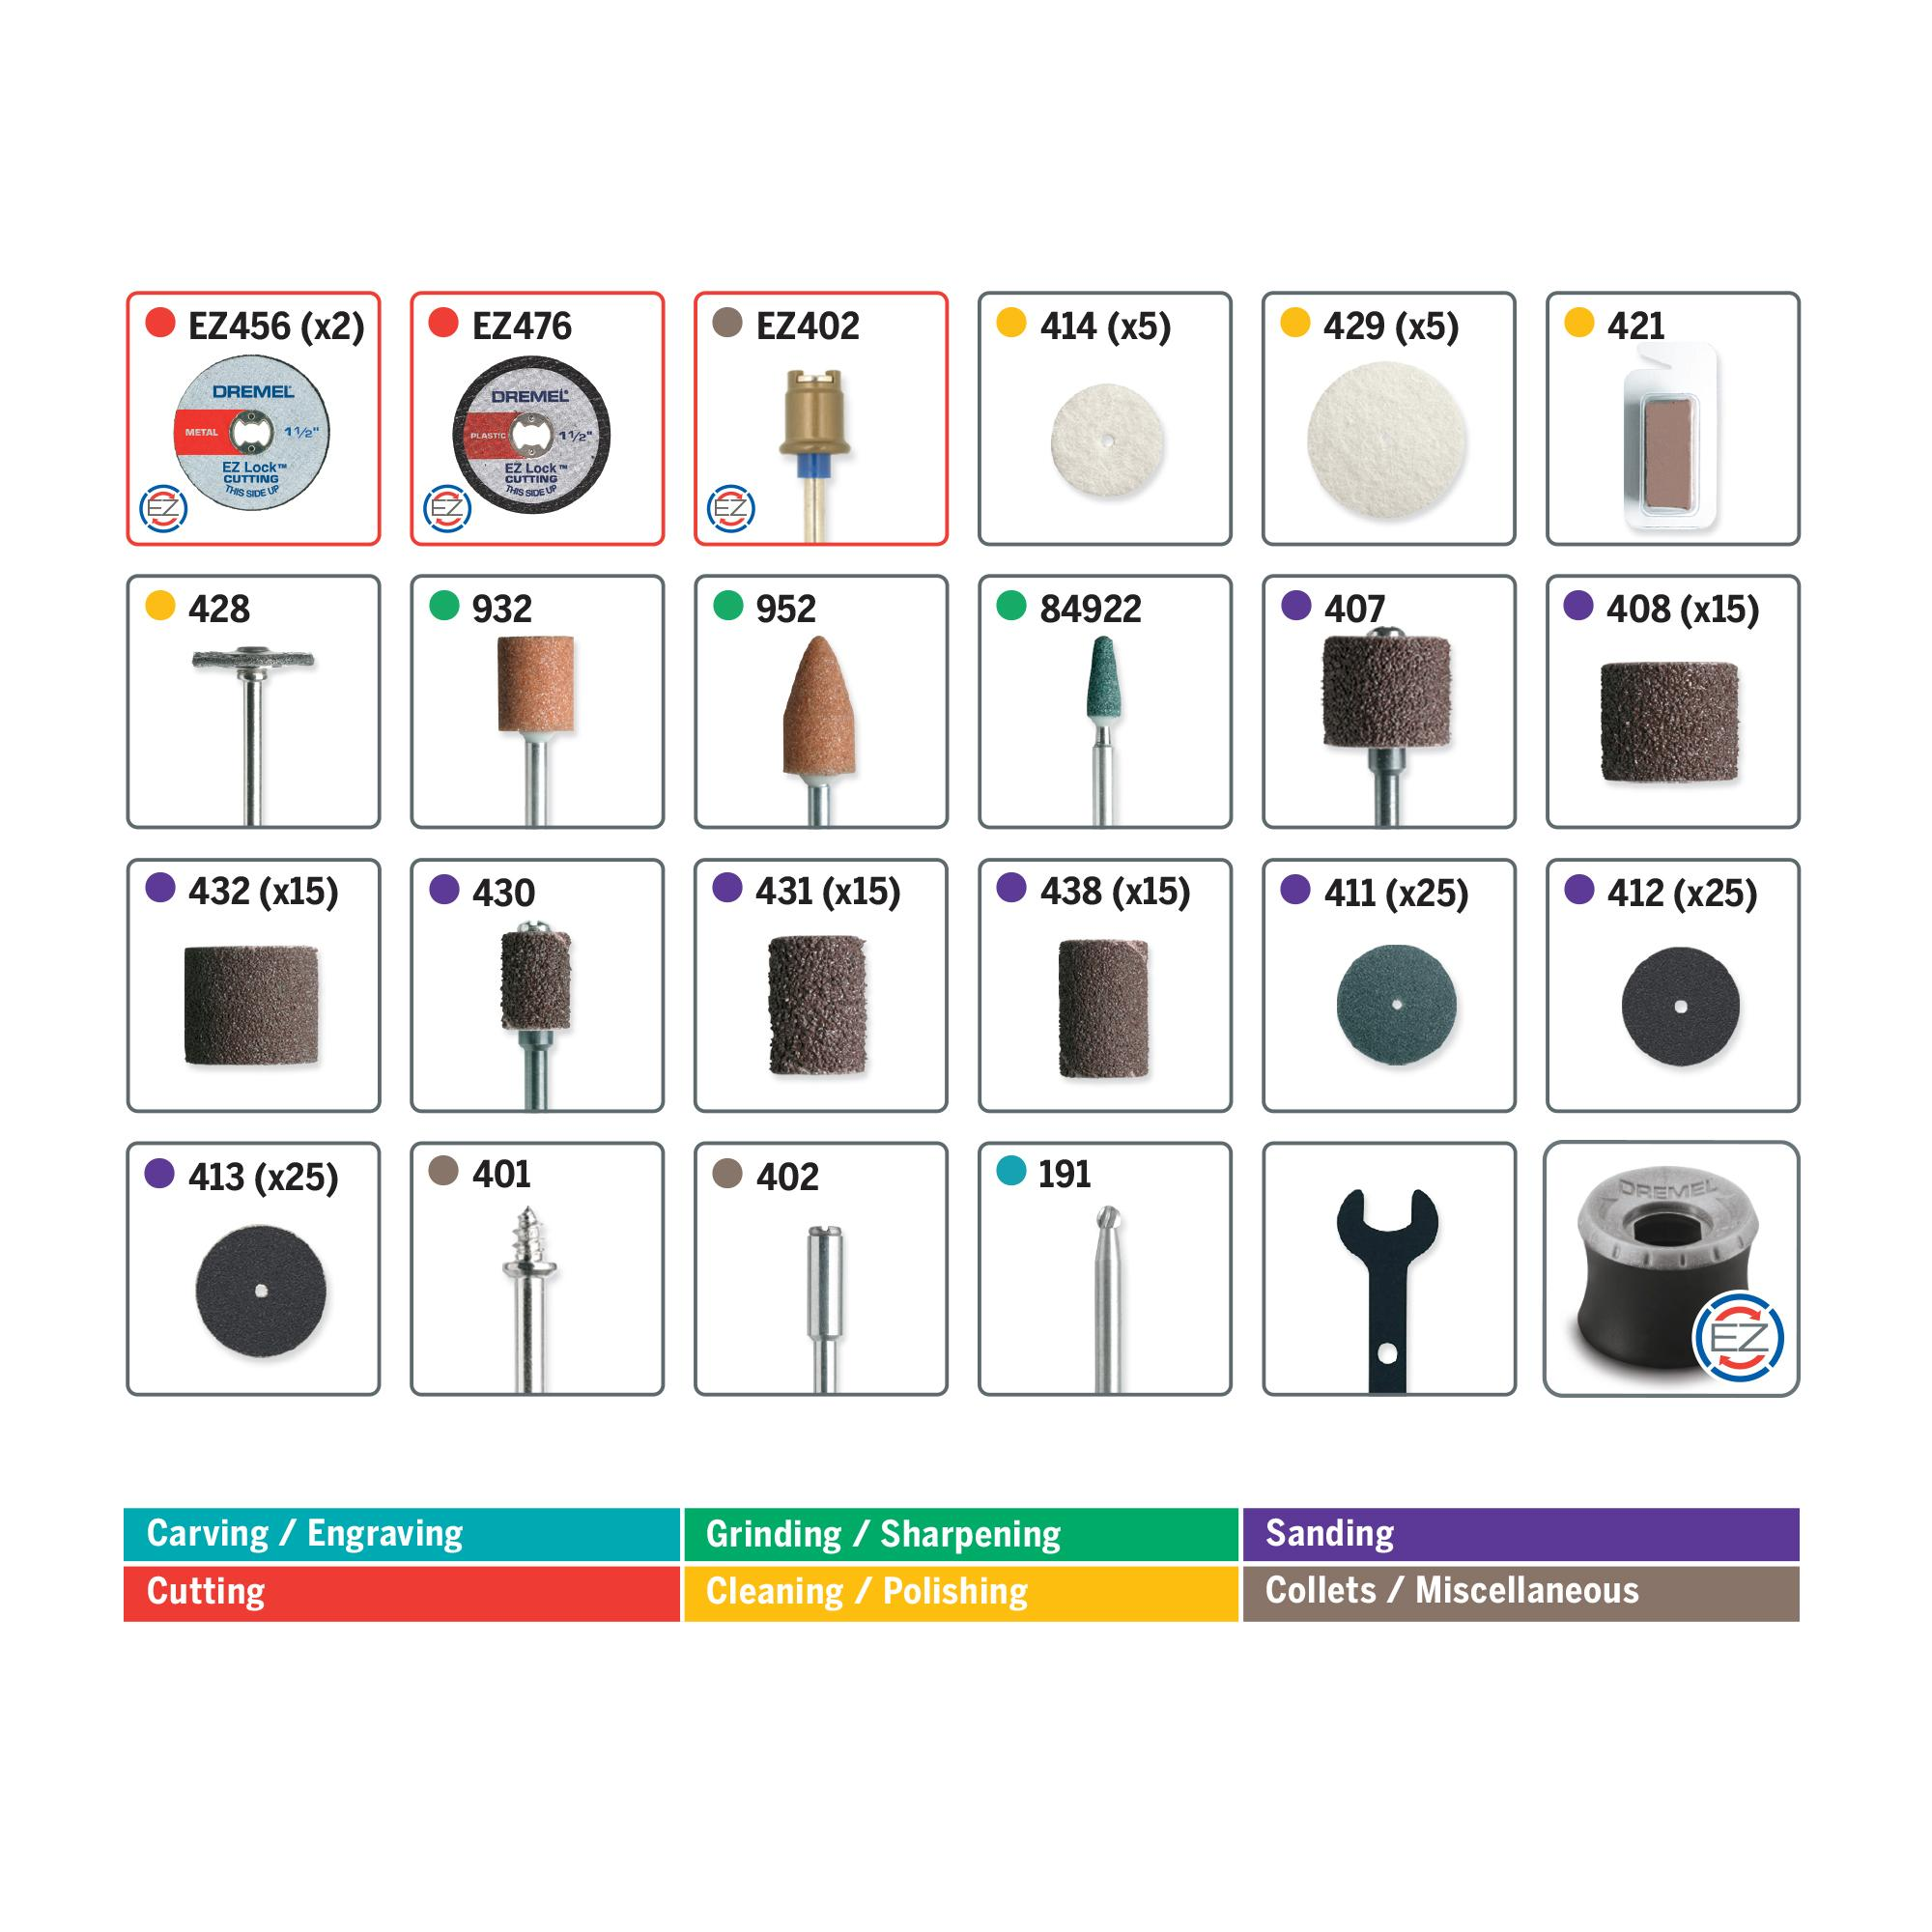 Dremel 710-08 All-Purpose Rotary Accessory Kit, 160-Piece - - Amazon